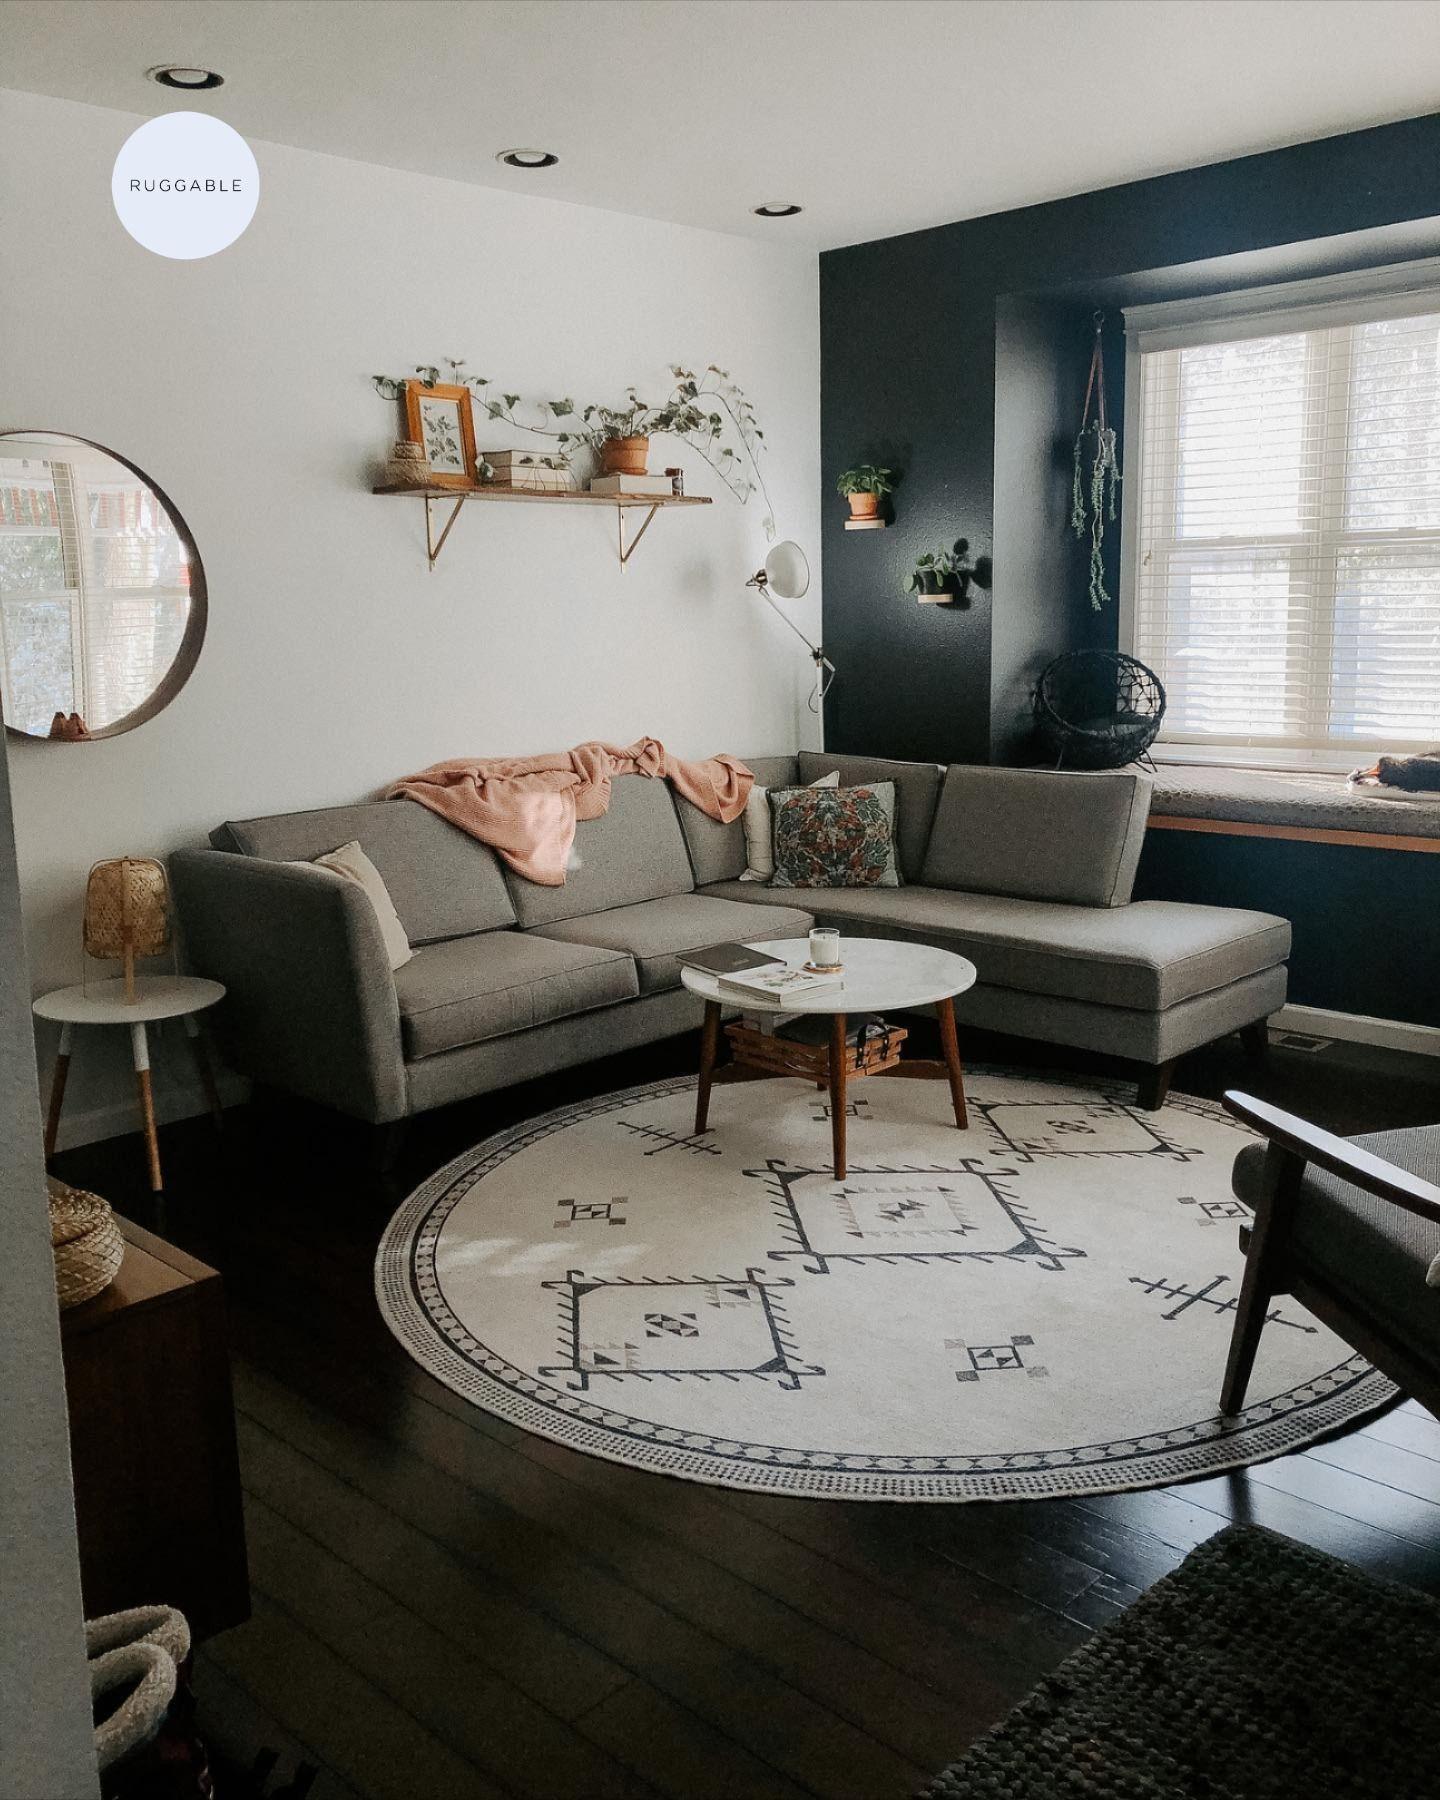 Damali Black White Rug In 2021 Round Rug Living Room White Rug Round Rug Living Room Layout